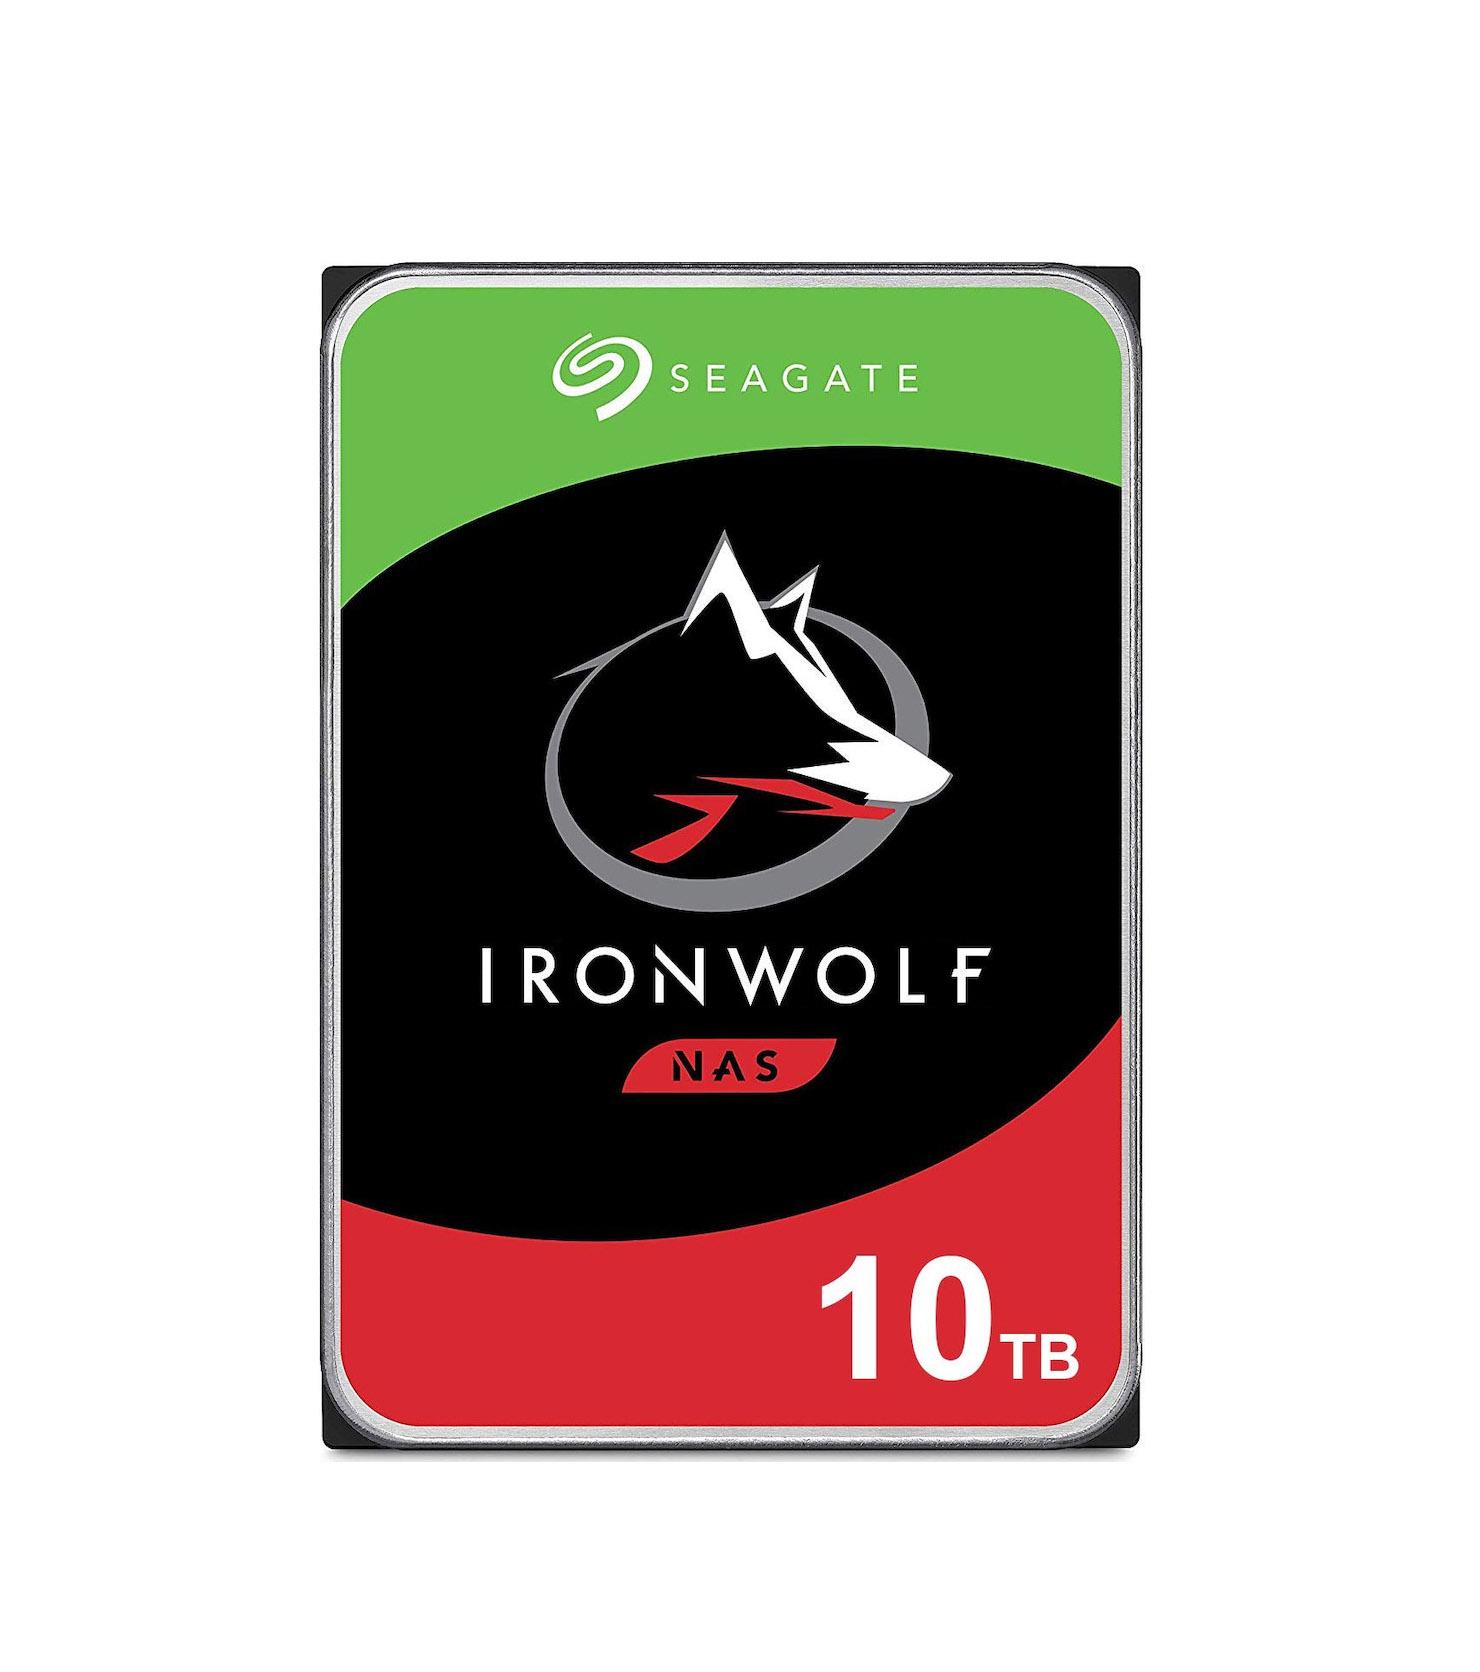 Seagate Ironwolf 10TB ST10000VN0008 Σκληρός Δίσκος 3.5'' Sata 3